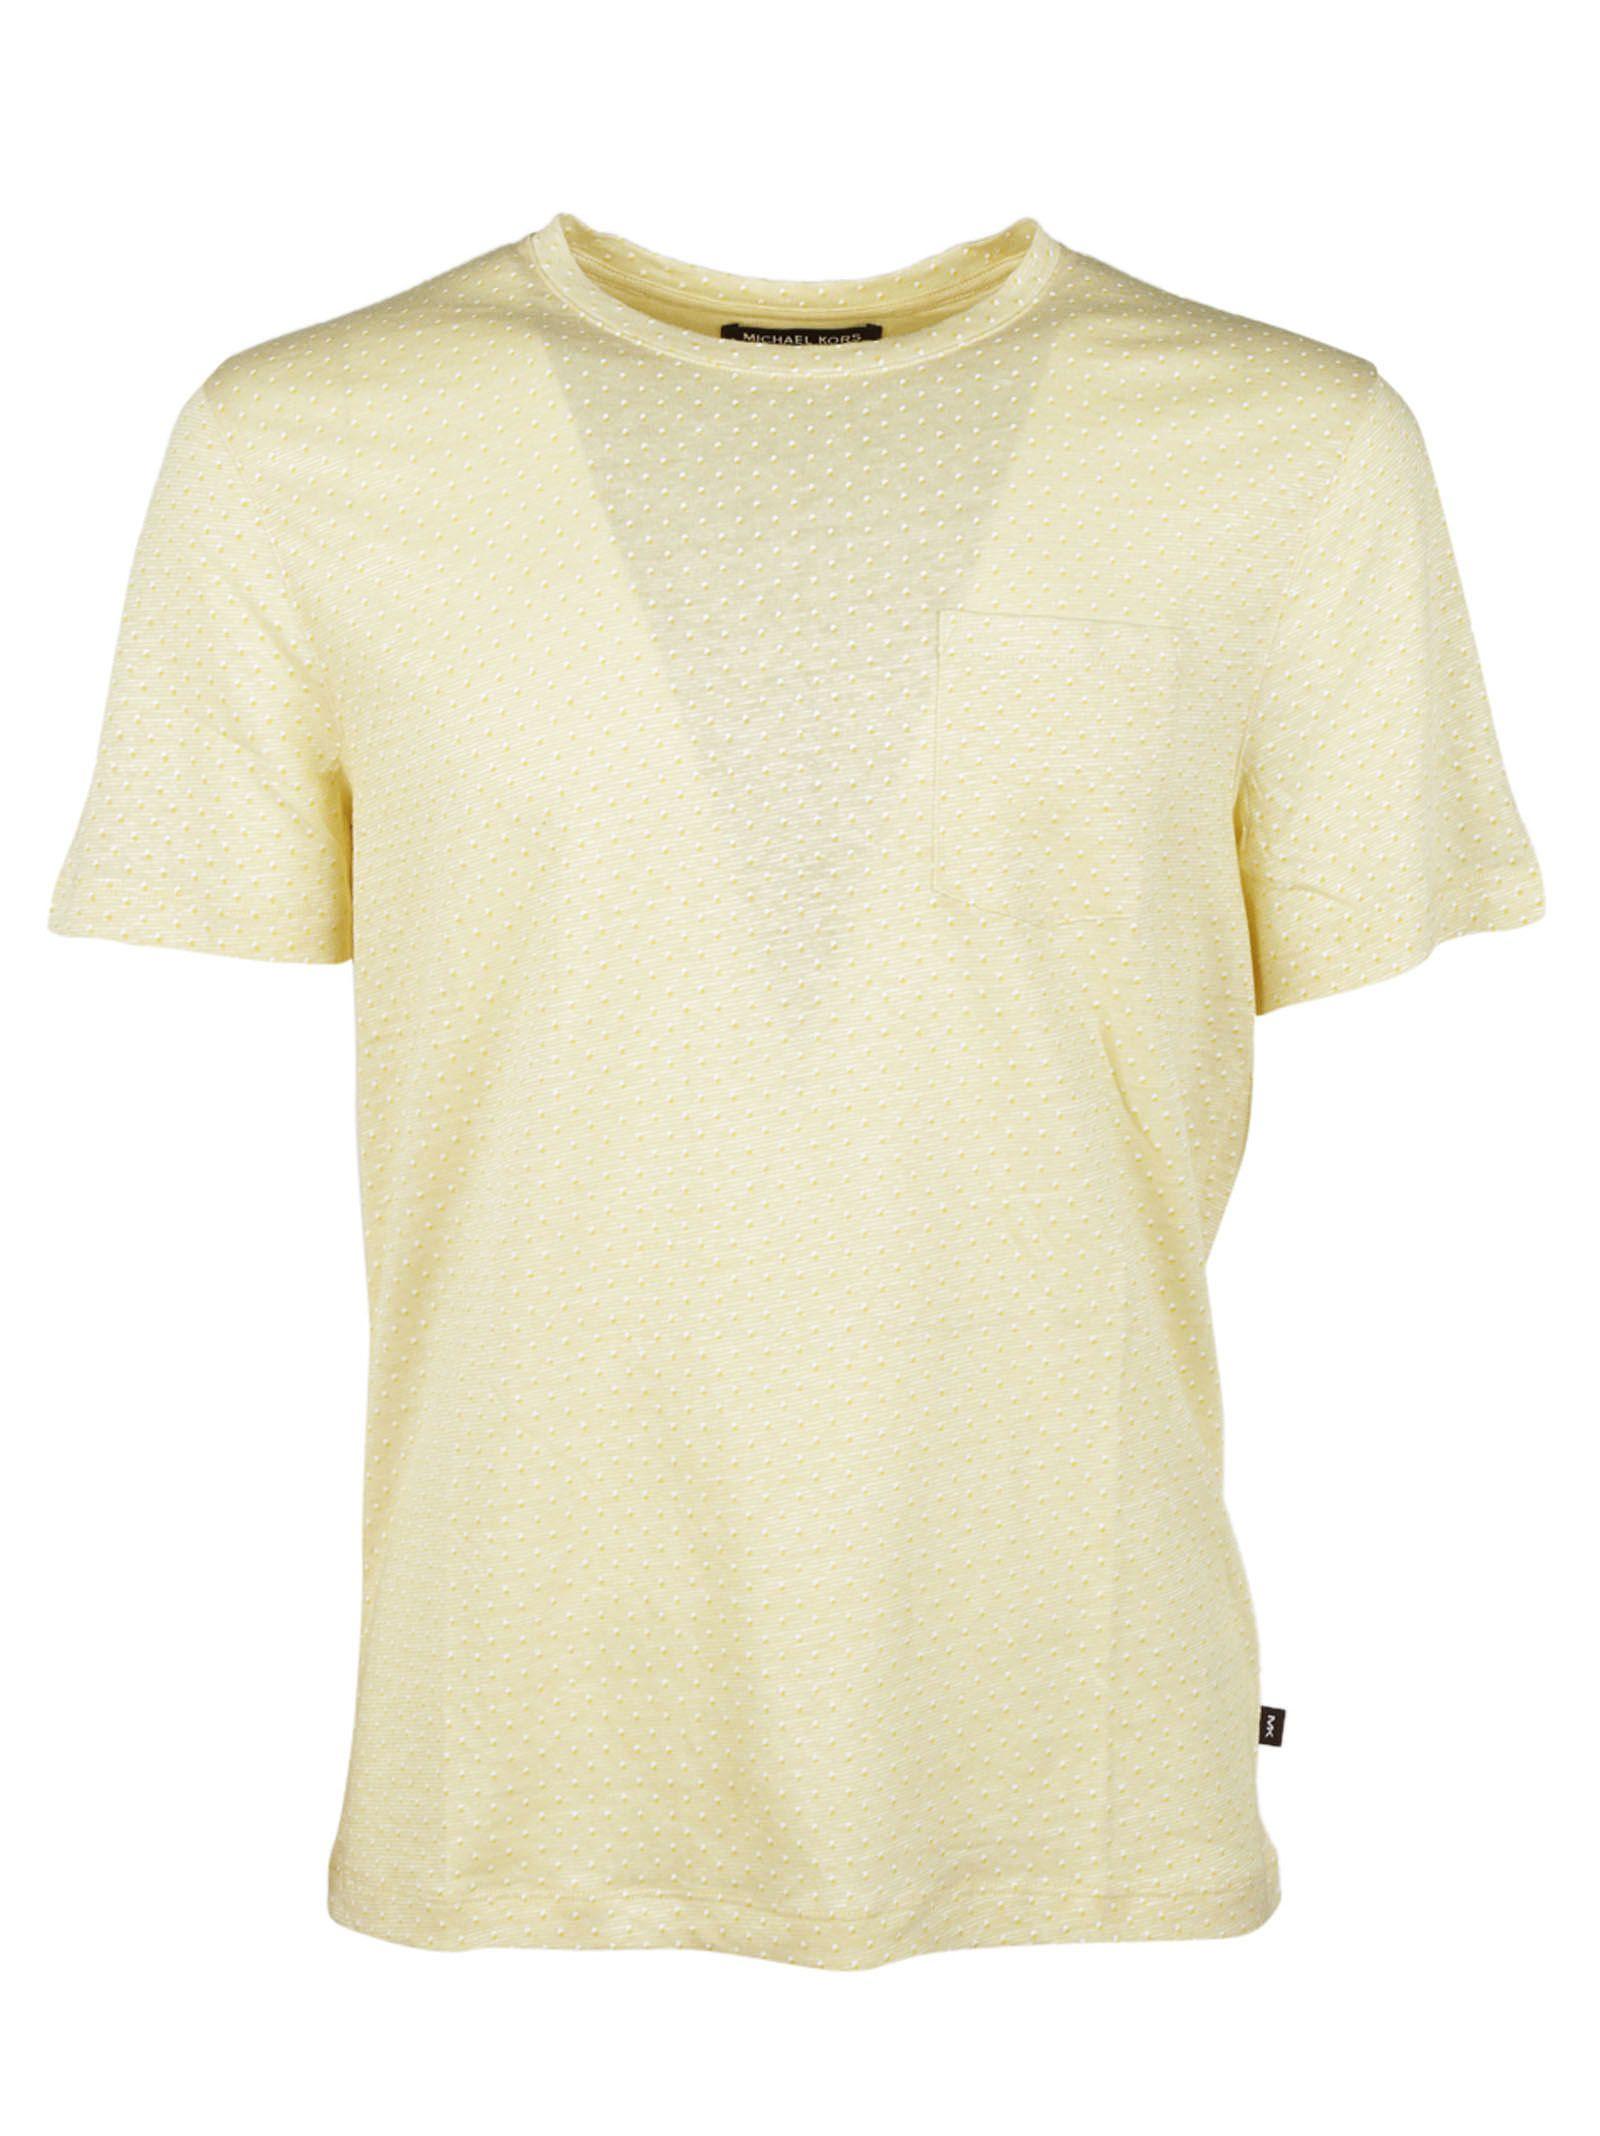 michael kors michael kors dot print t shirt yellow. Black Bedroom Furniture Sets. Home Design Ideas